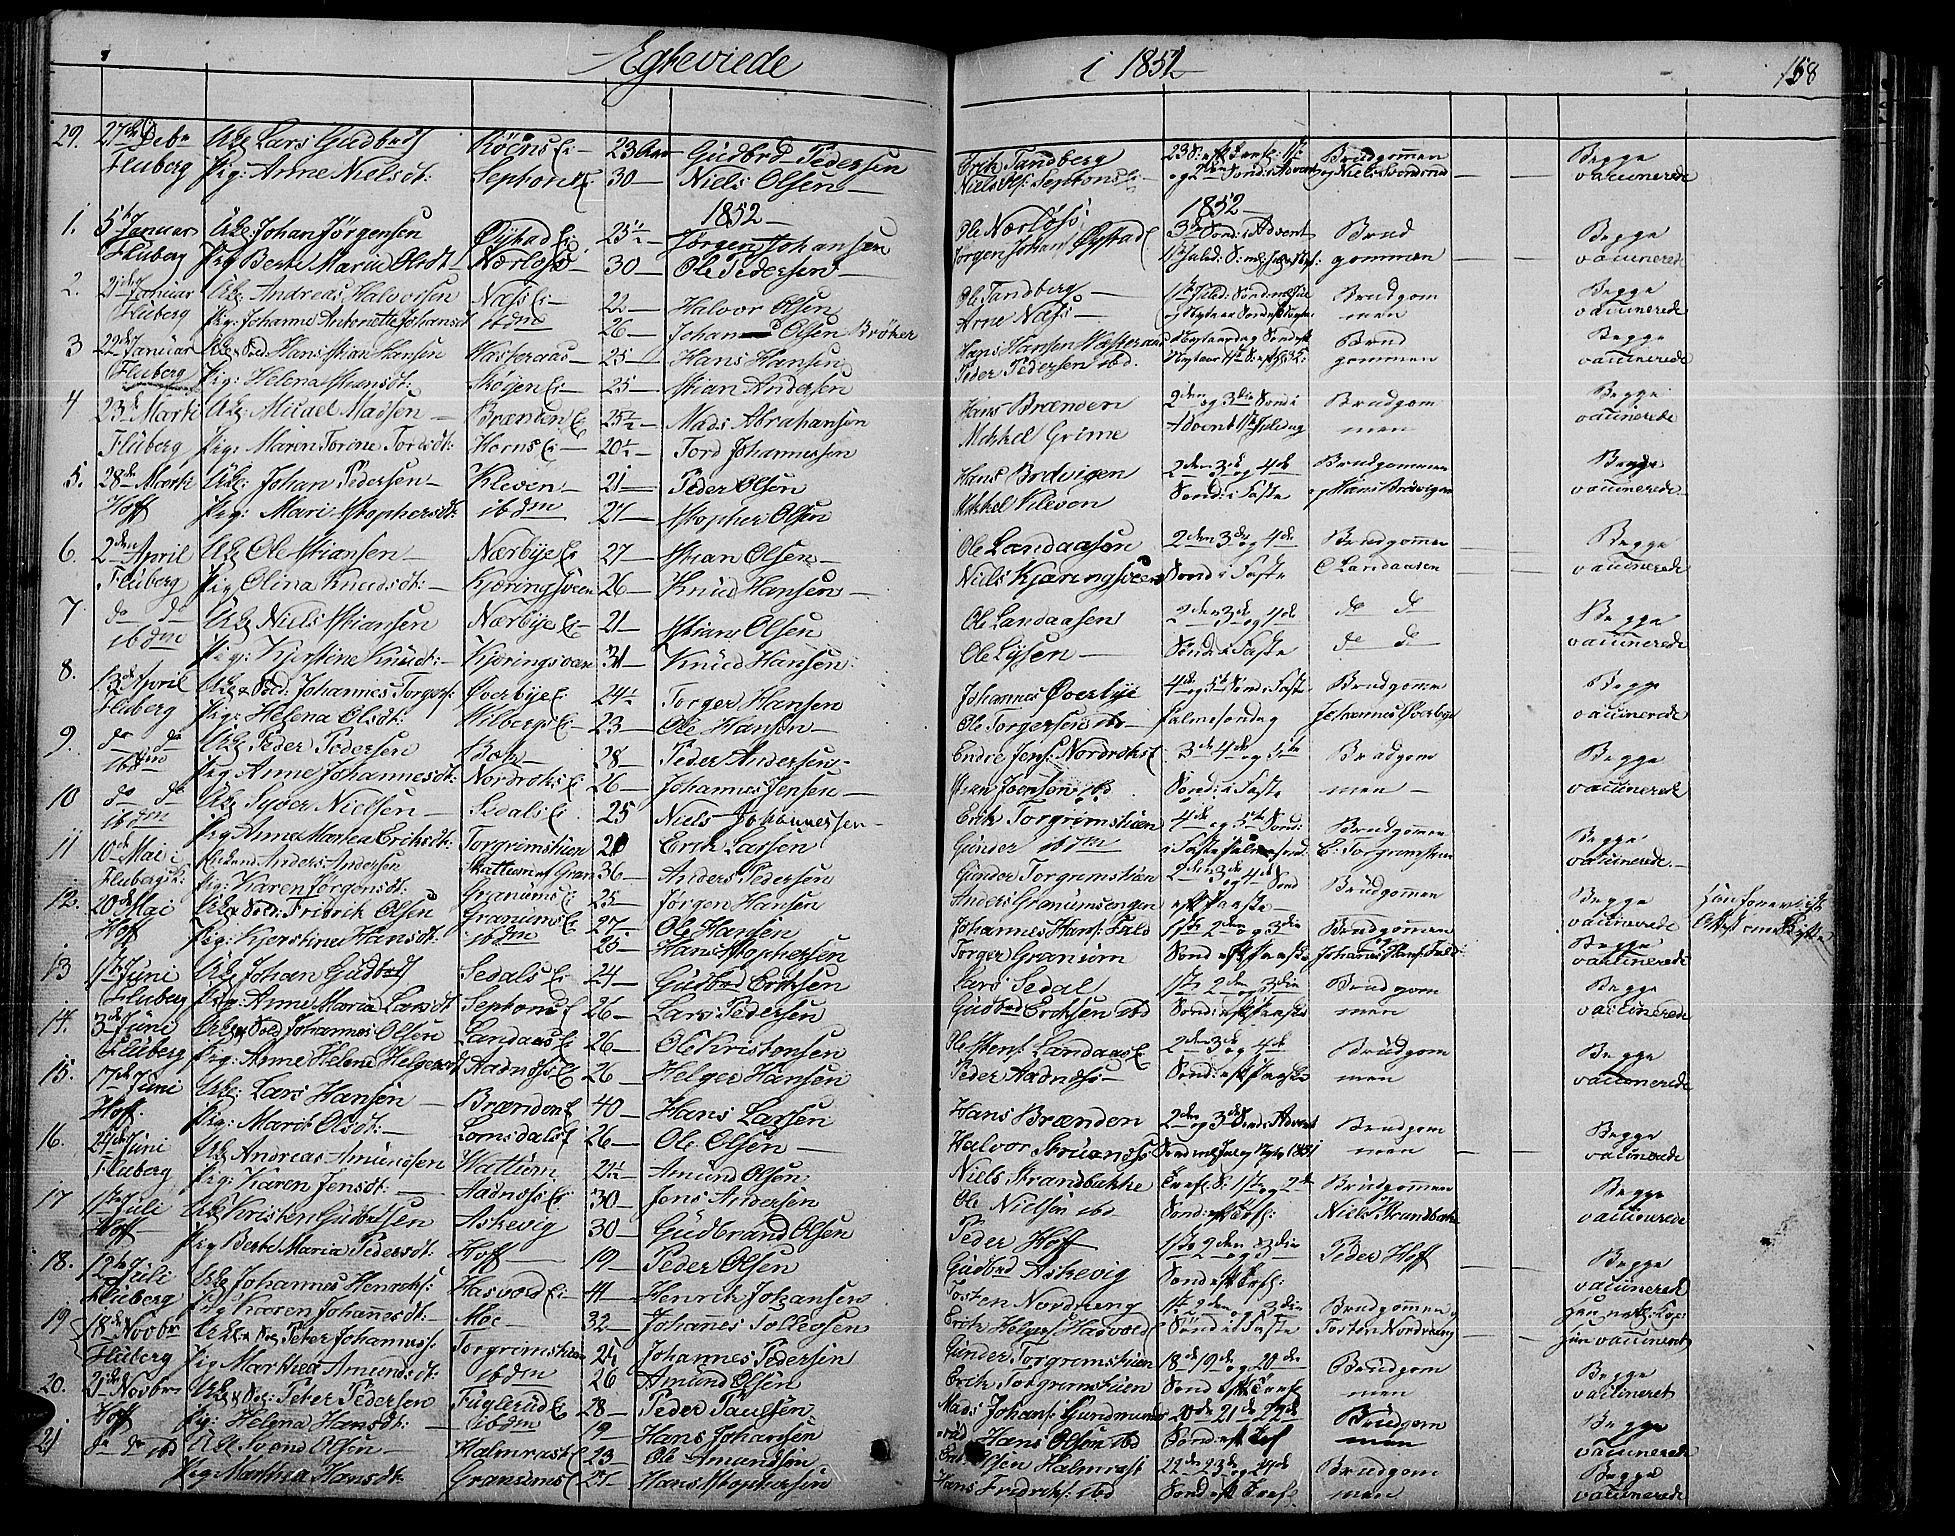 SAH, Søndre Land prestekontor, L/L0001: Klokkerbok nr. 1, 1849-1883, s. 158